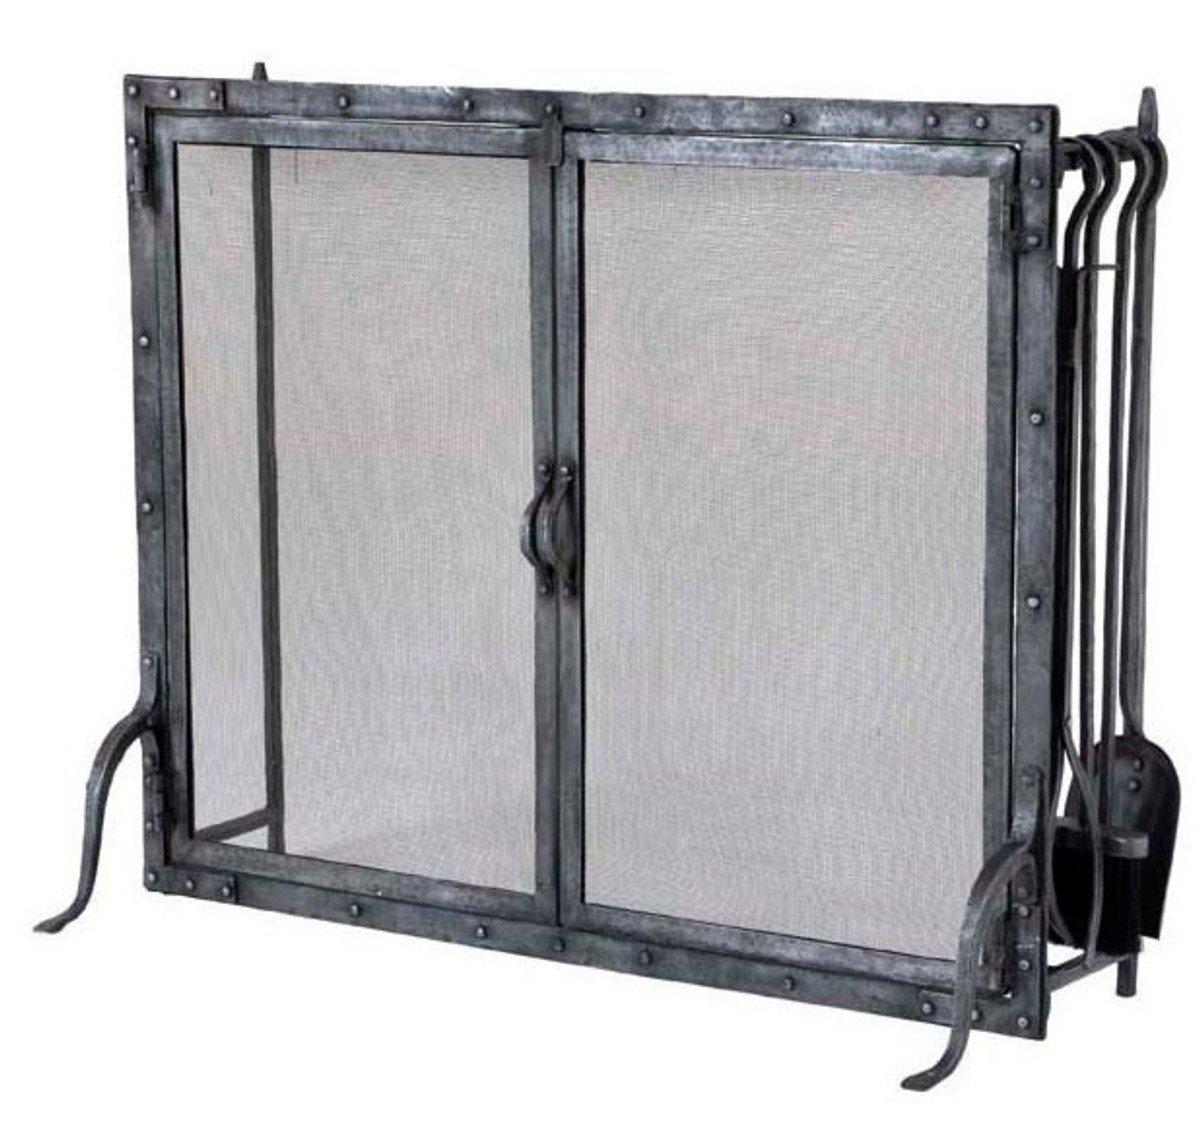 Casa Padrino Luxury Fireplace Fire Screen Stand with Fireplace Tools - Galvanized Metal - Pure Luxury!: Amazon.es: Hogar